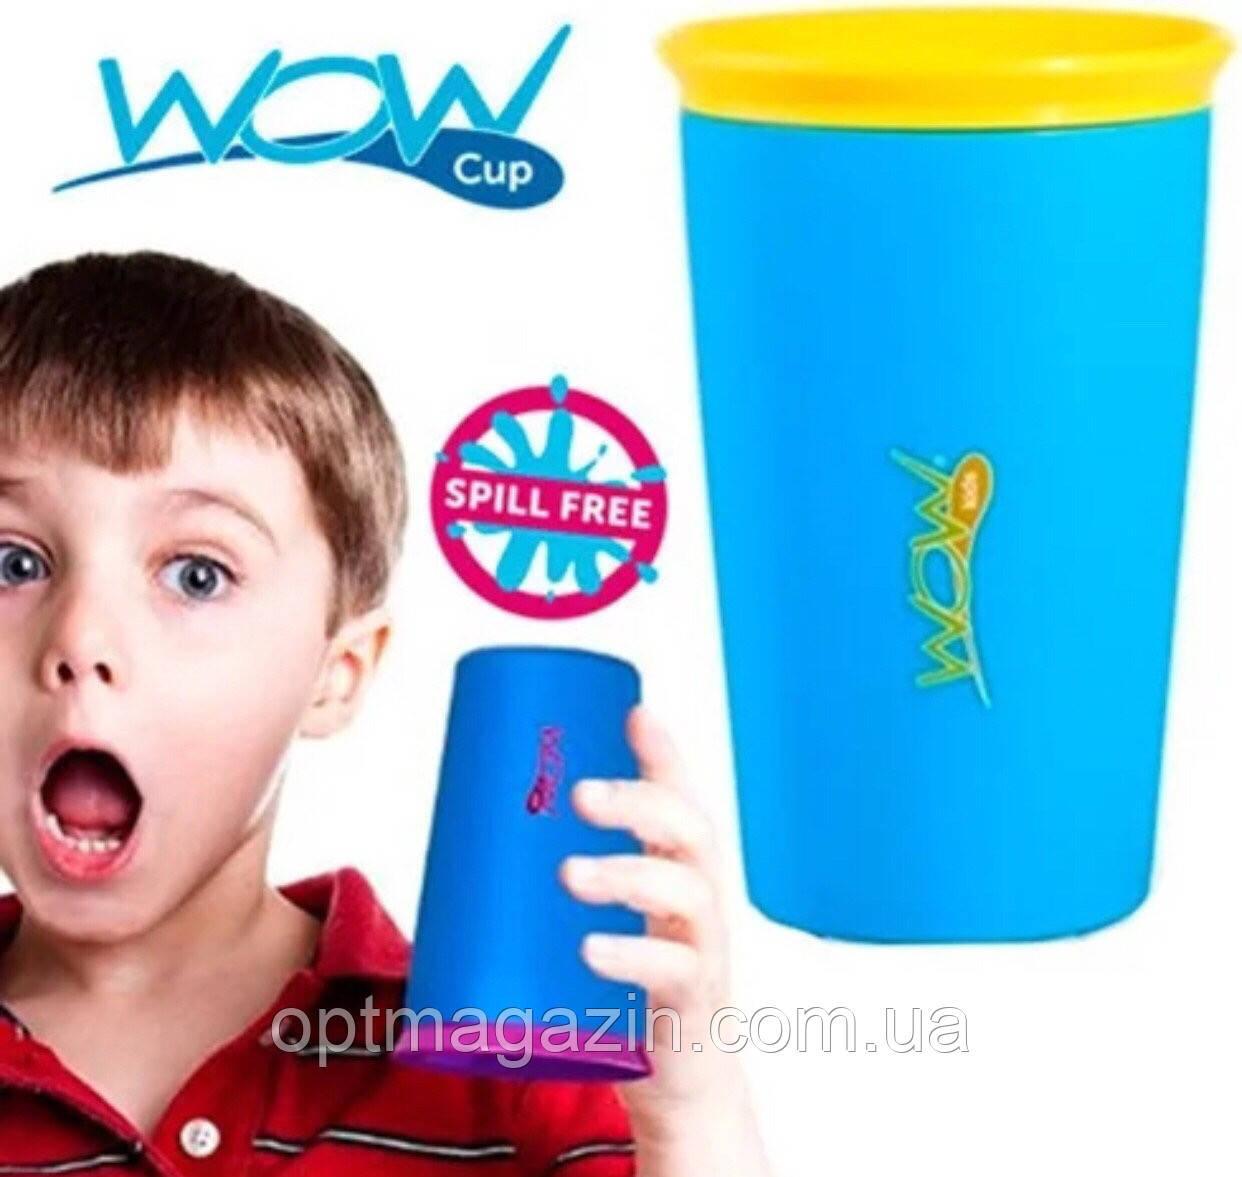 Кружка непроливайка Wow Cup | Силиконовая кружка непроливайка